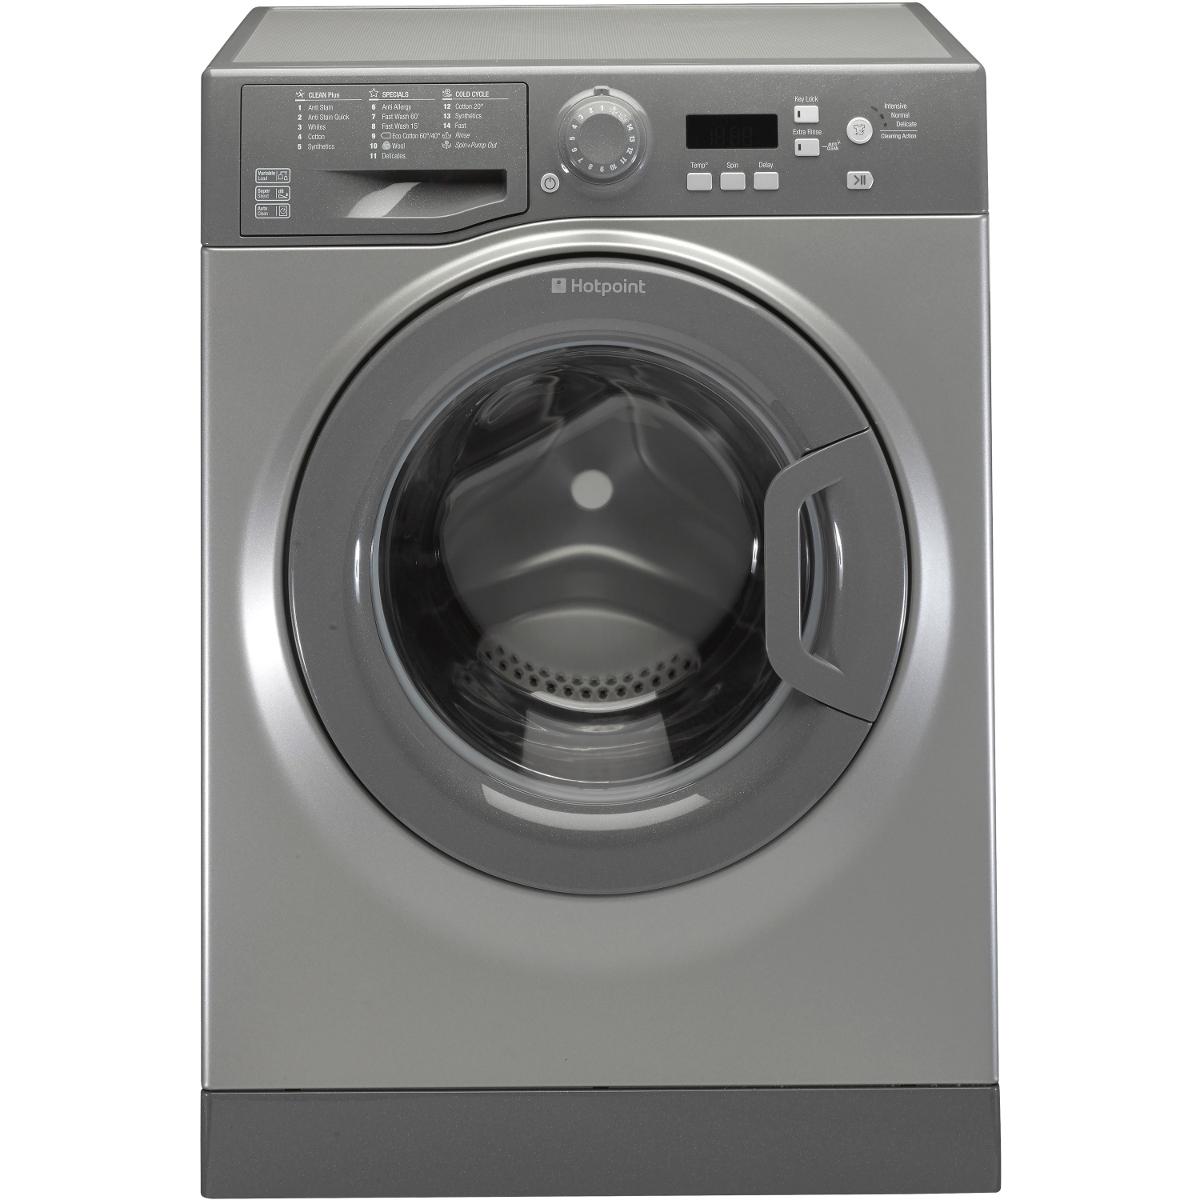 Hotpoint Wmeuf743g 1400 Spin 7kg Washing Machine